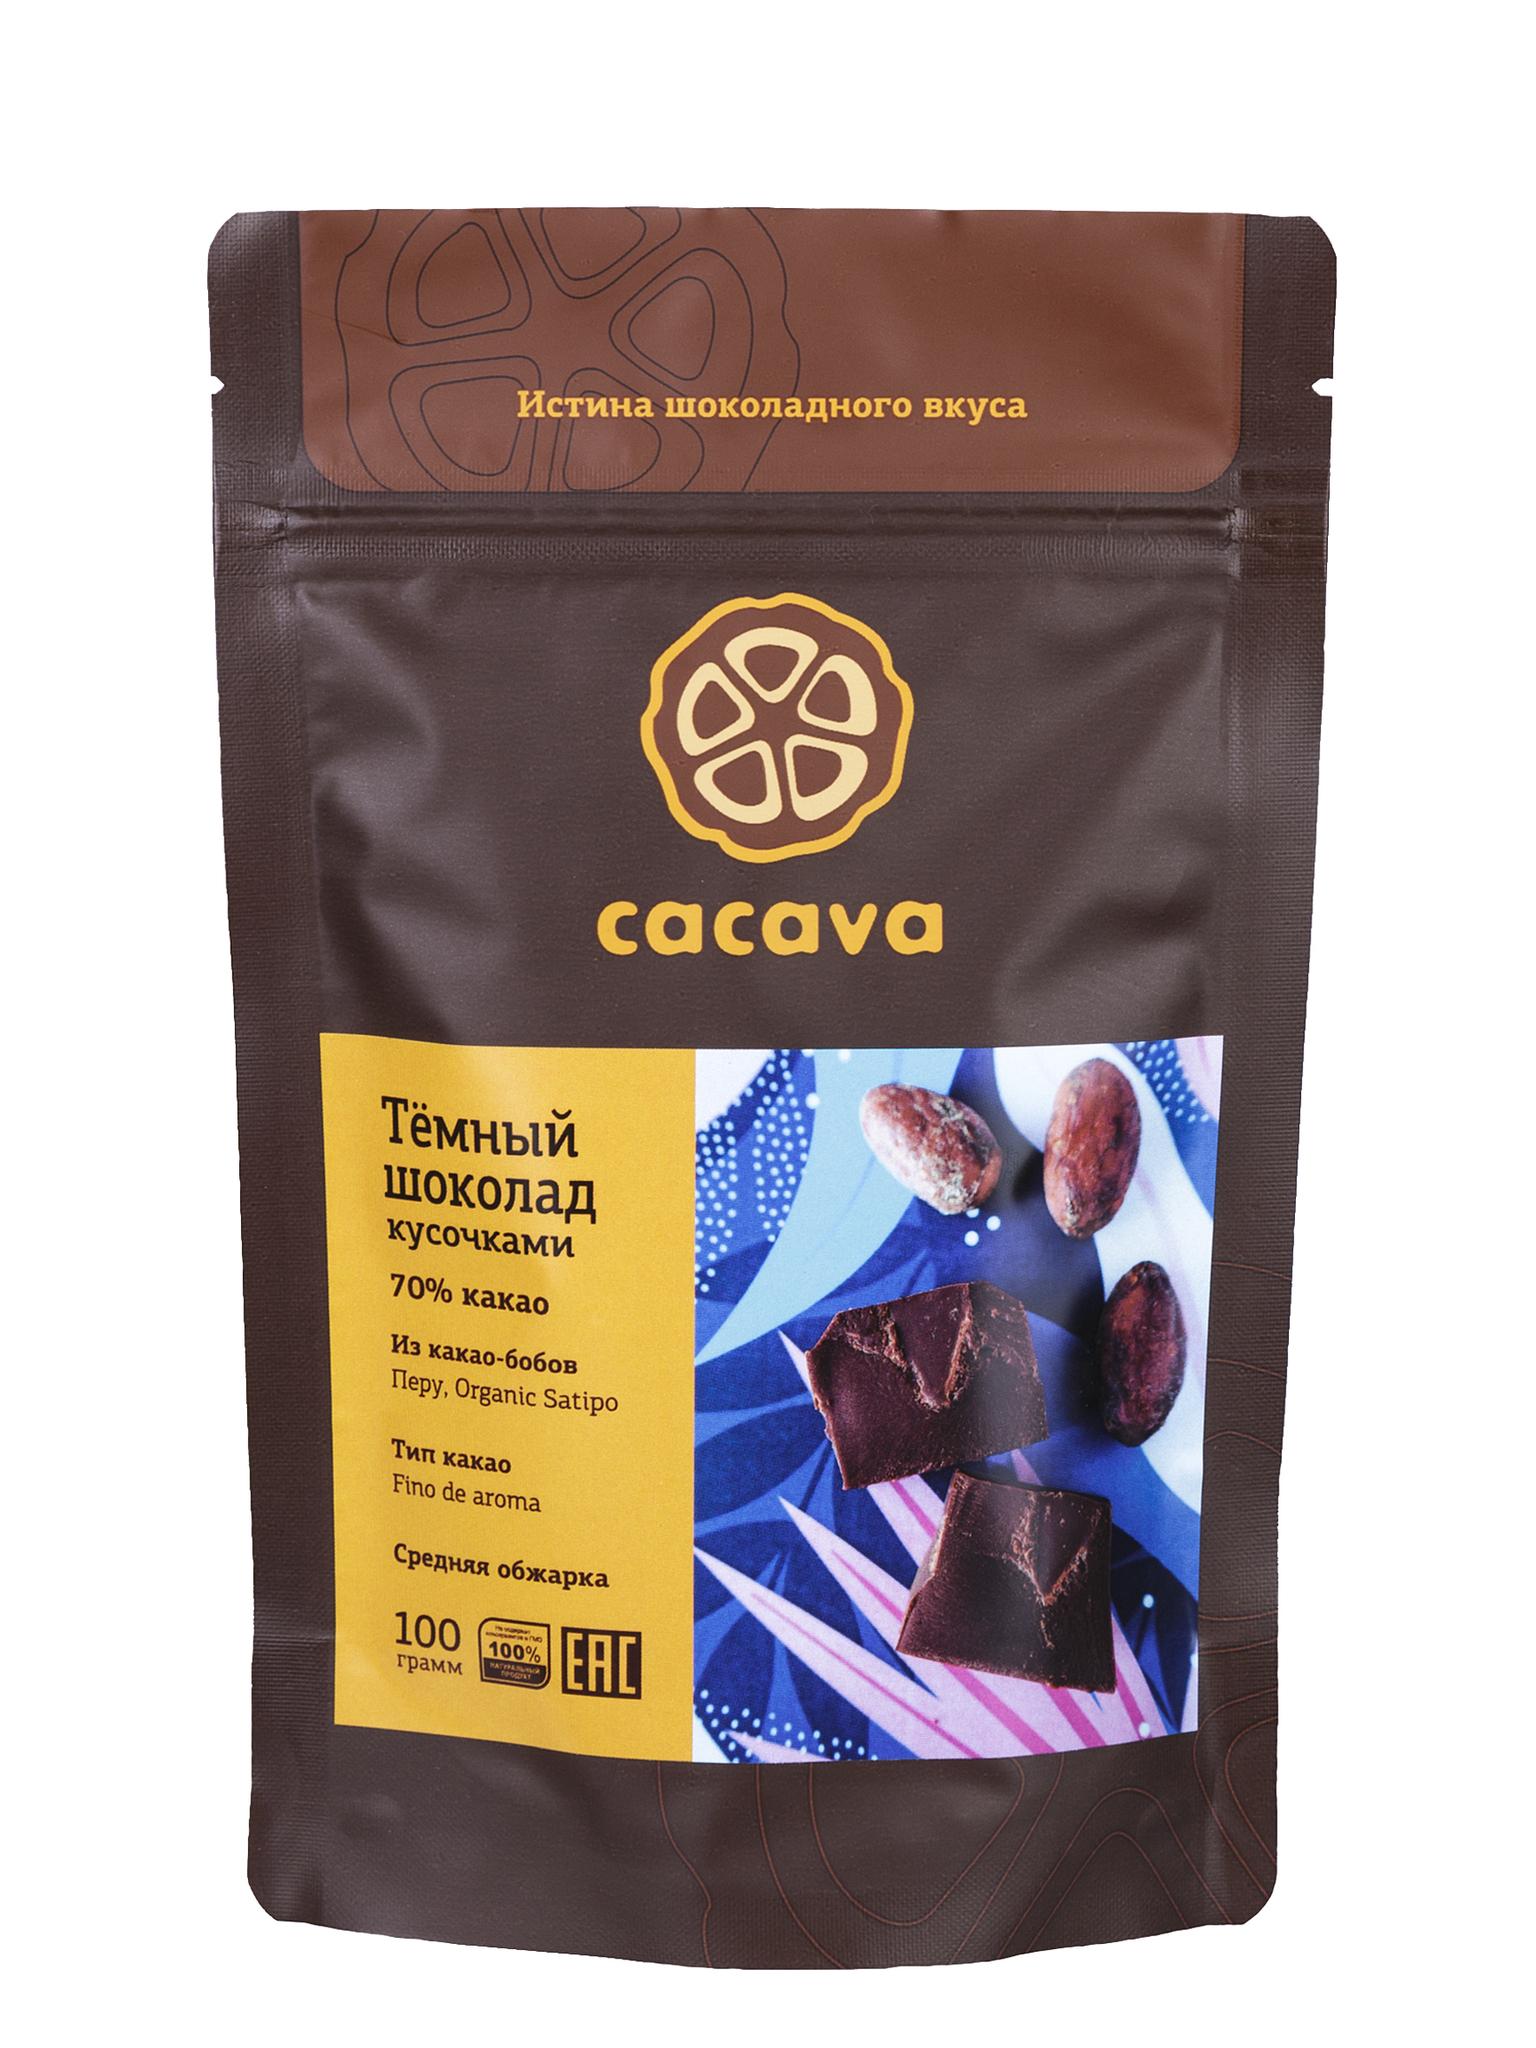 Тёмный шоколад 70 % какао (Перу, Organic Satipo), упаковка 100 грамм